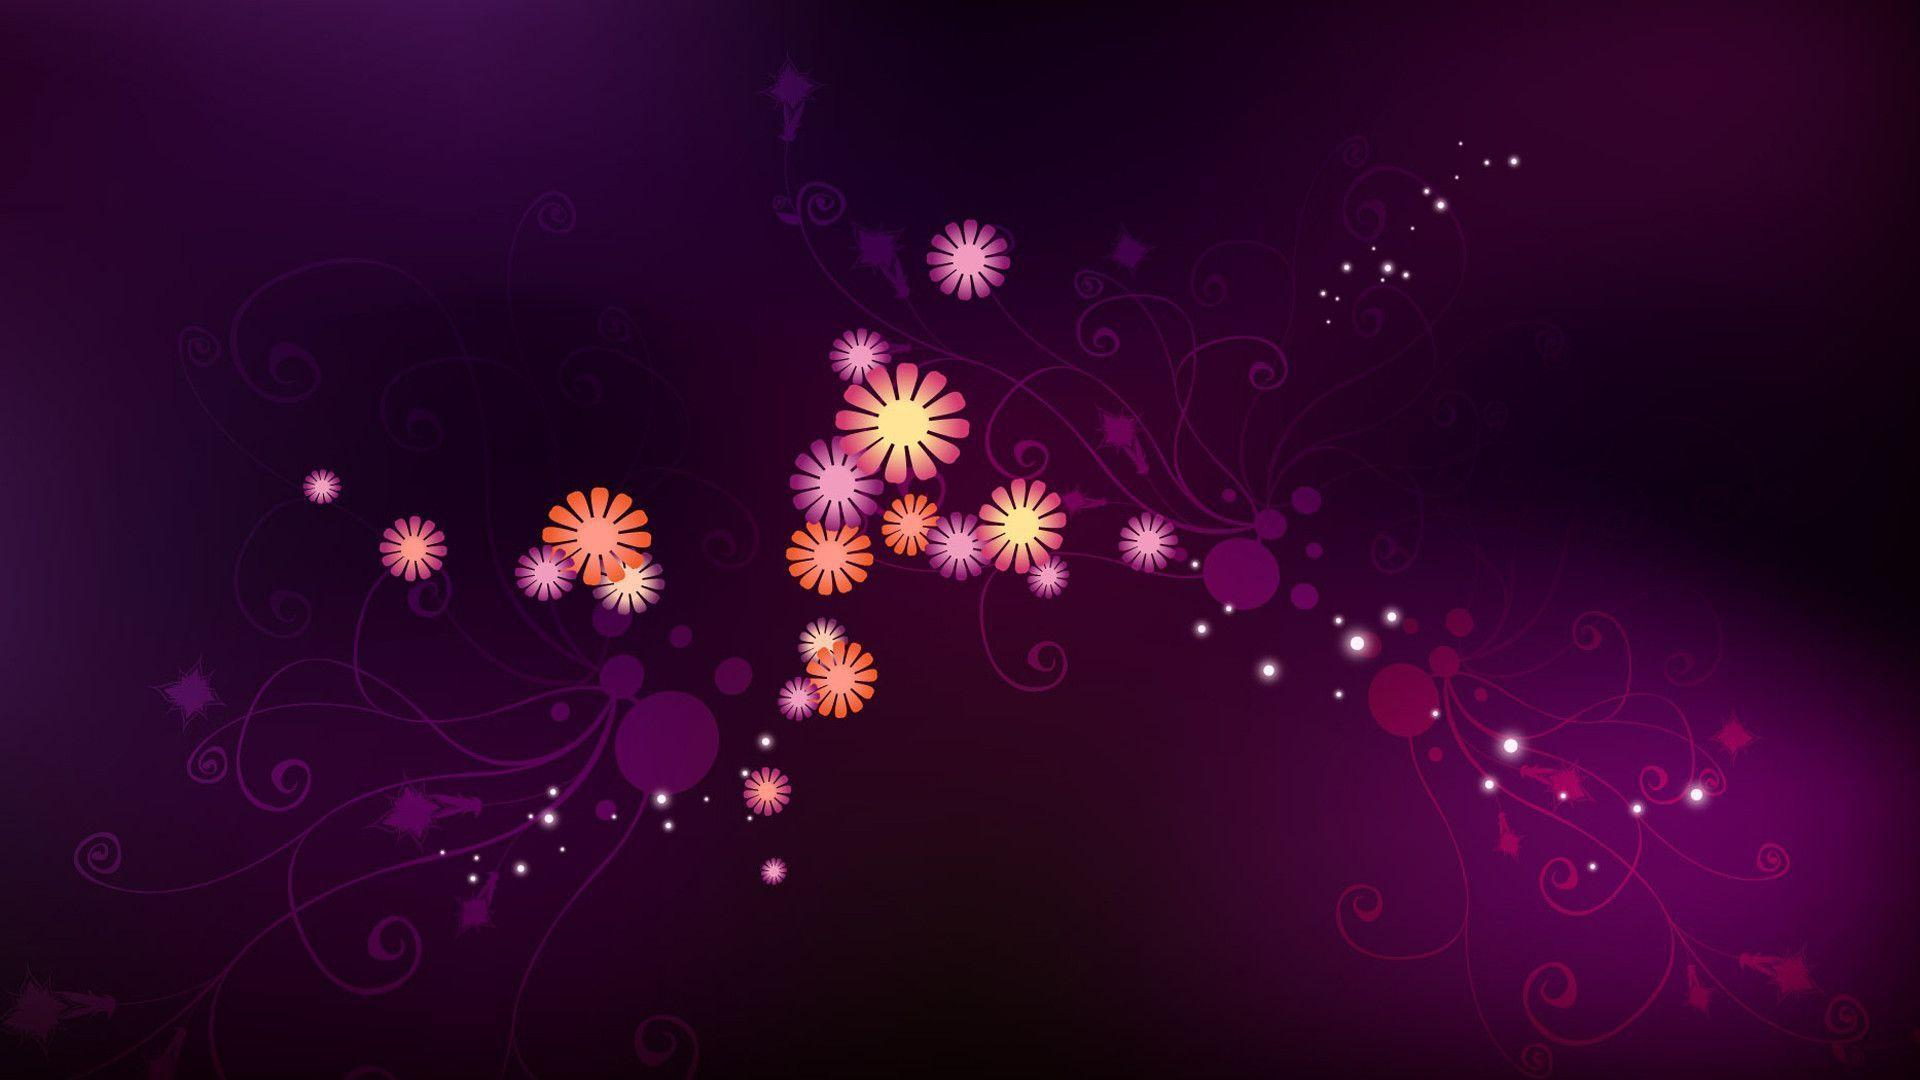 purple spidey computer wallpapers - photo #40